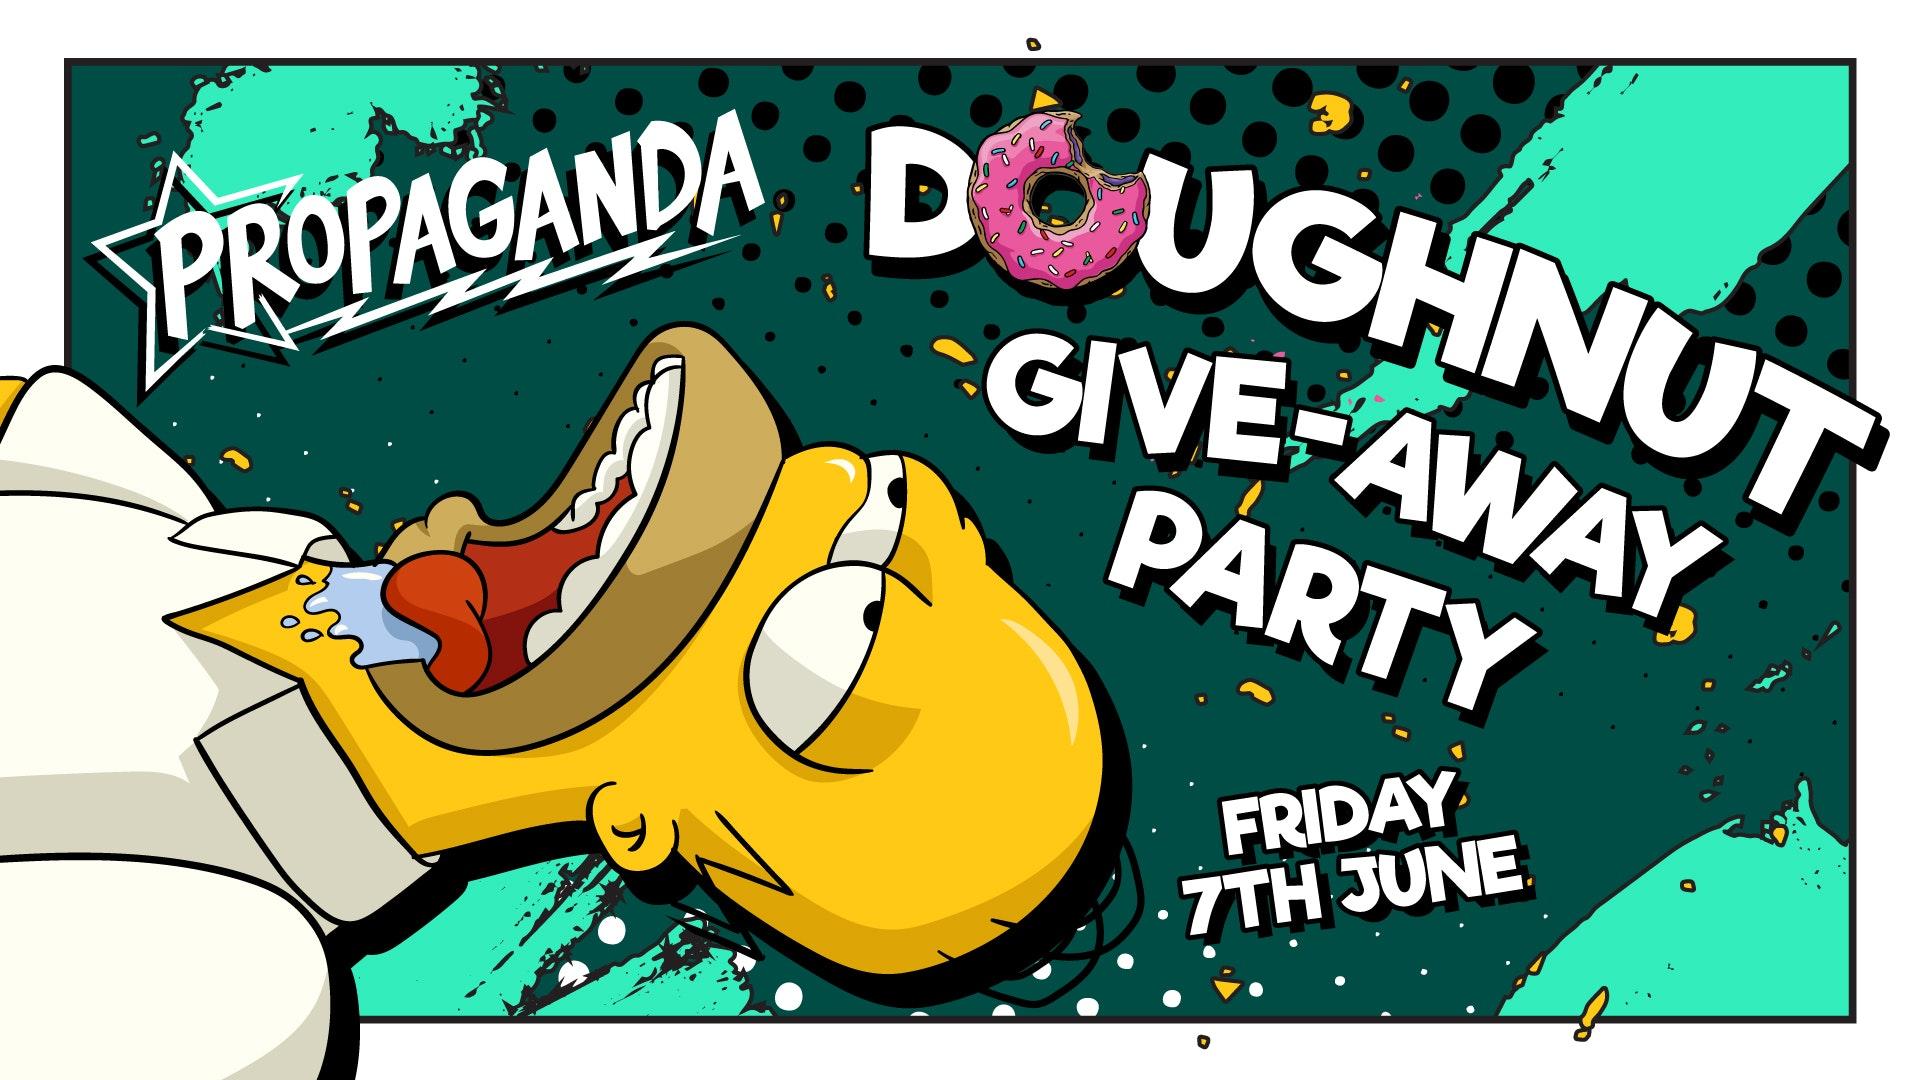 Propaganda Bath – Doughnut Party!